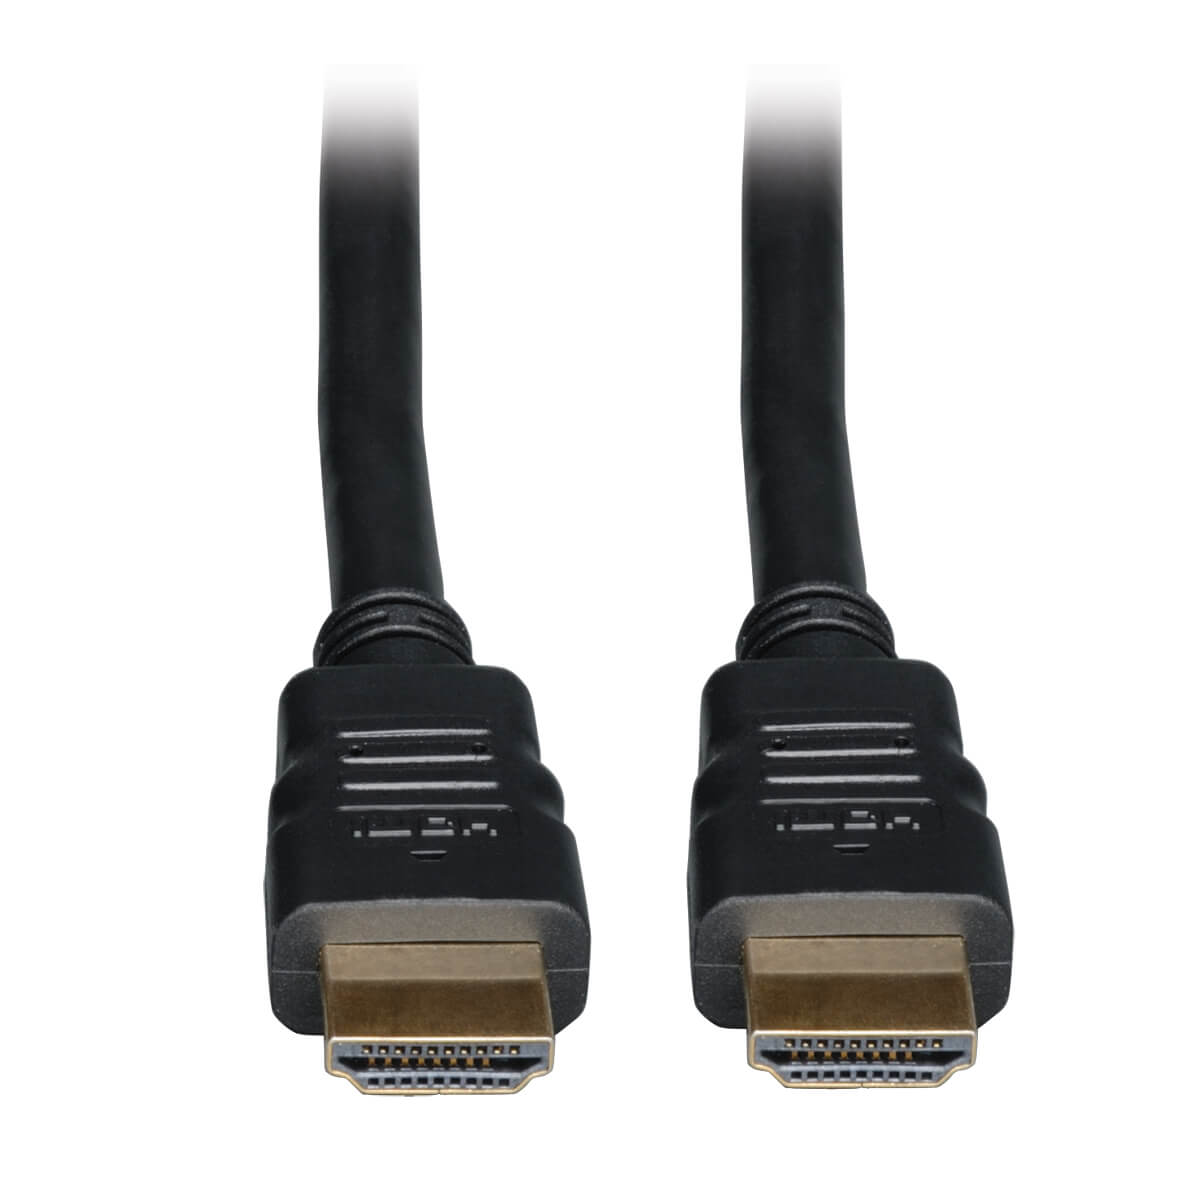 j5 create JUD380 USB 3 0 Mini Dock - docking station - VGA